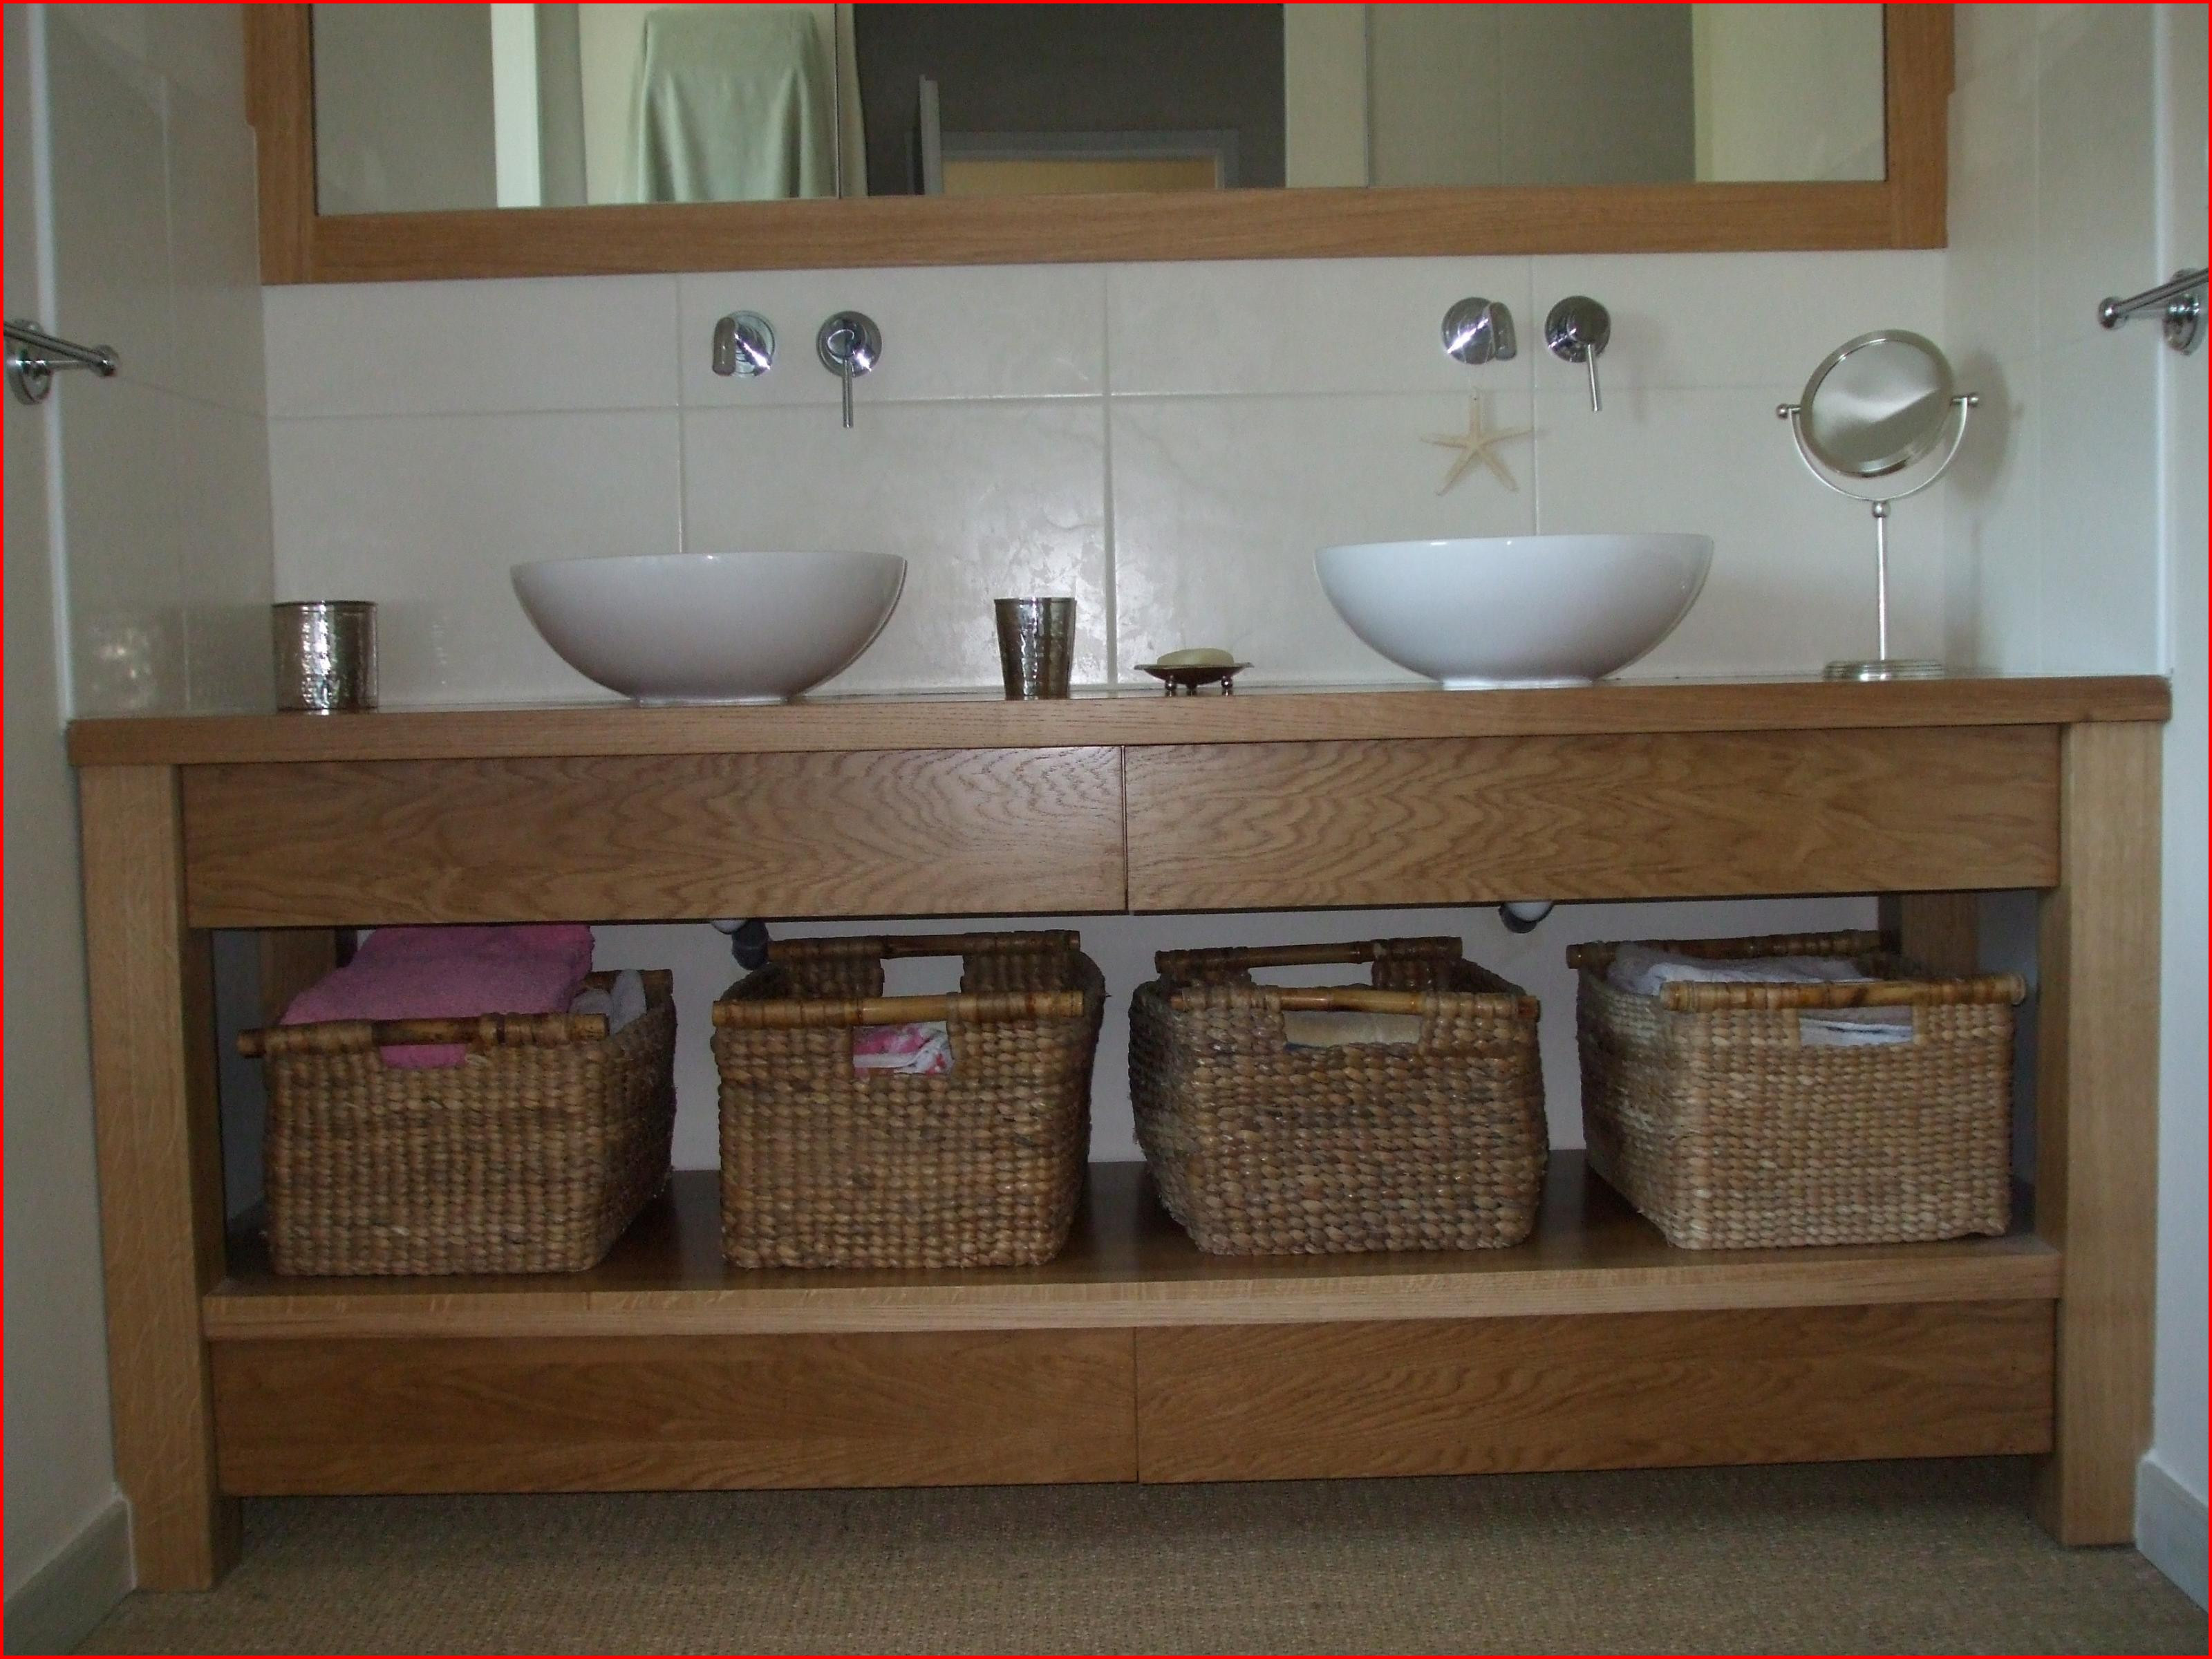 Fabriquer un plan de travail de salle de bain